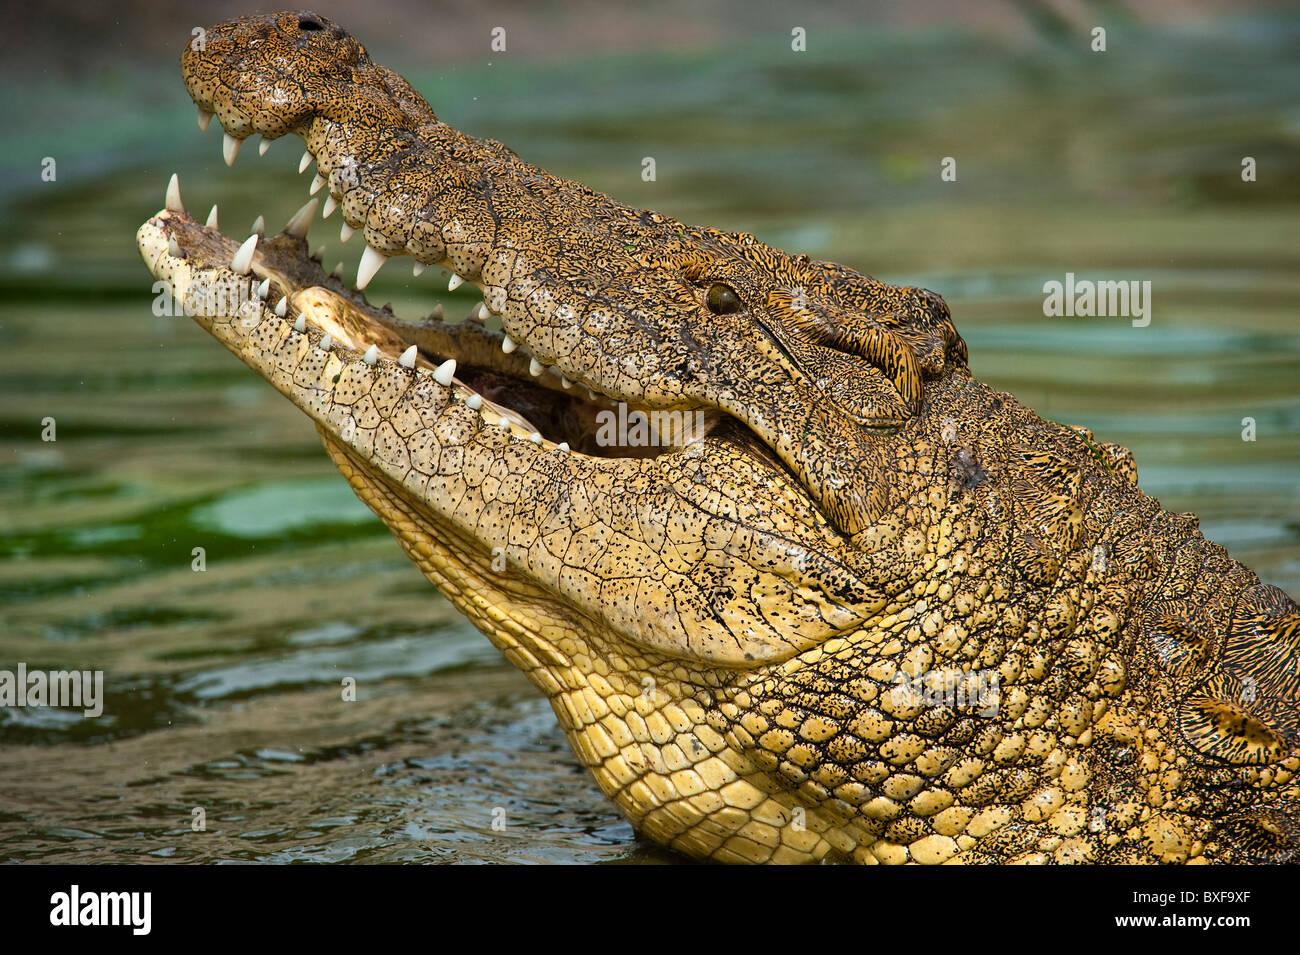 Nil-Krokodil (Crocodylus Niloticus) aus dem Wasser schauen. Stockbild